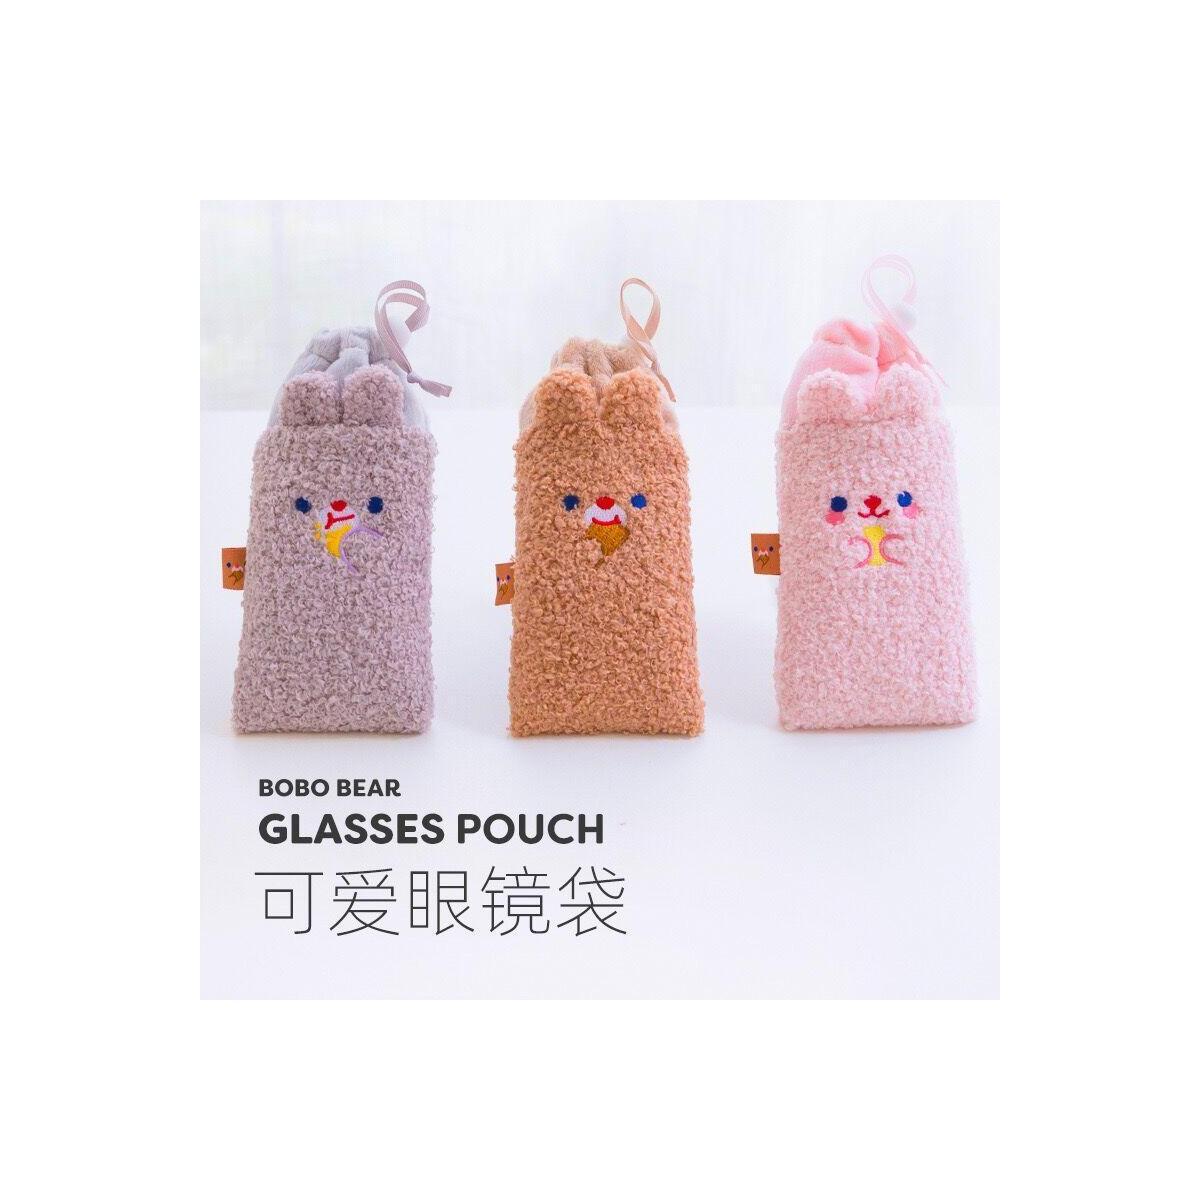 Cute Plush Bear Eye Glasses Travel Pouch, Grey